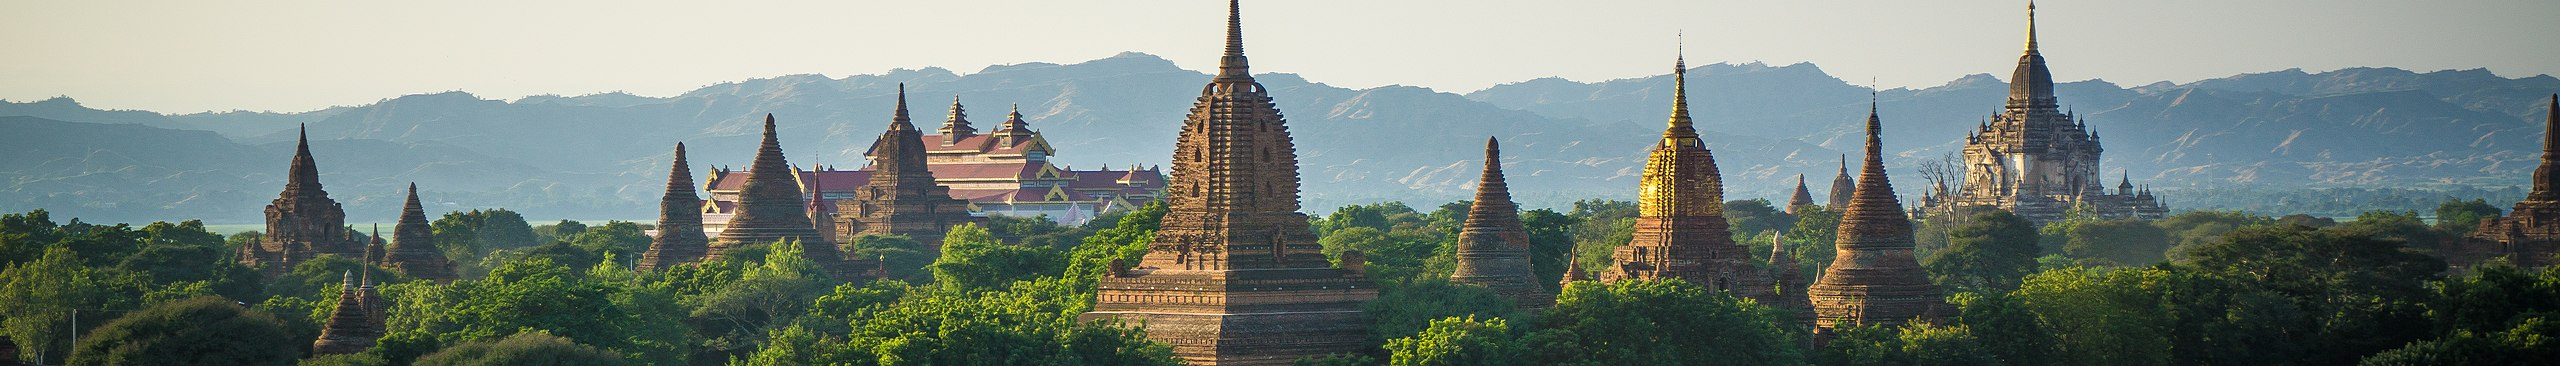 Bagan – Travel guide at Wikivoyage